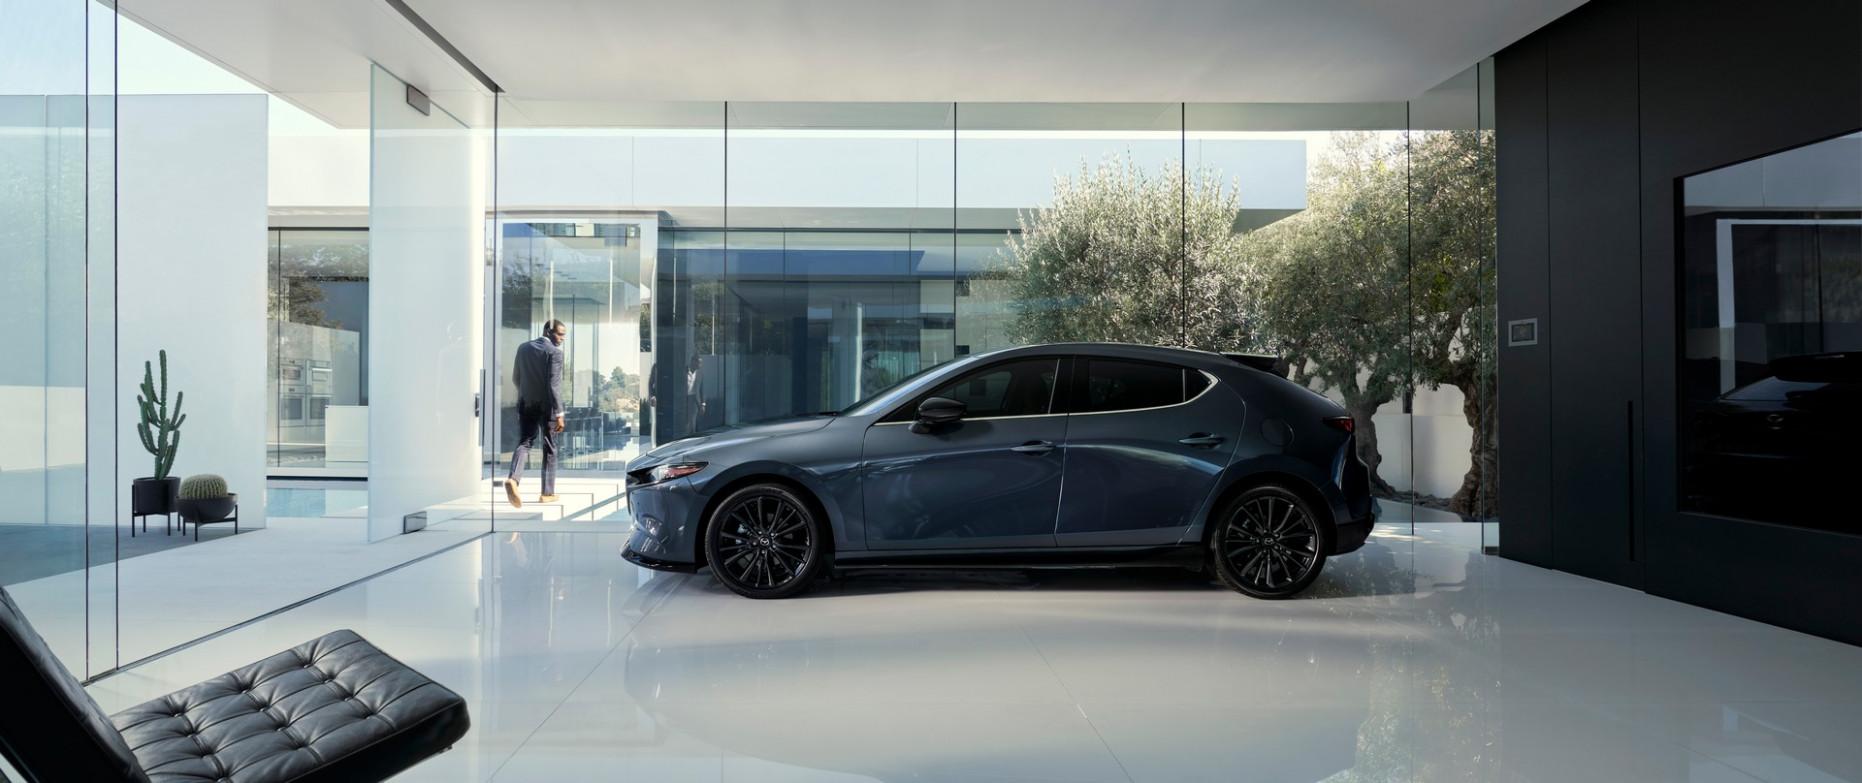 Pricing 2022 Mazdaspeed 3